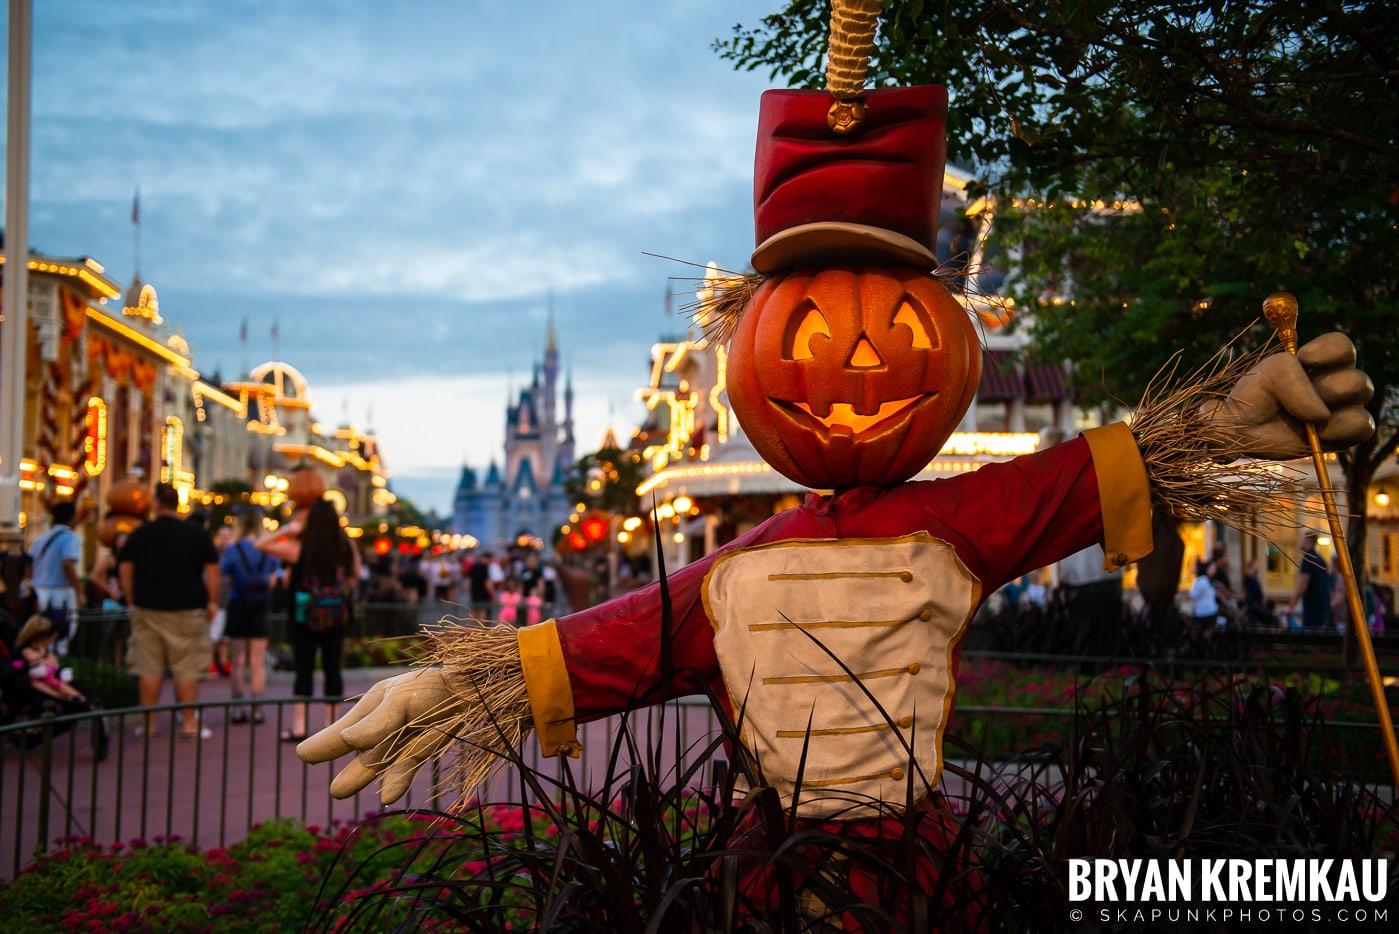 Walt Disney World Vacation: Day 6 (Magic Kingdom, Epcot, Disney's Hollywood Studios) - 10.4.19 (49)